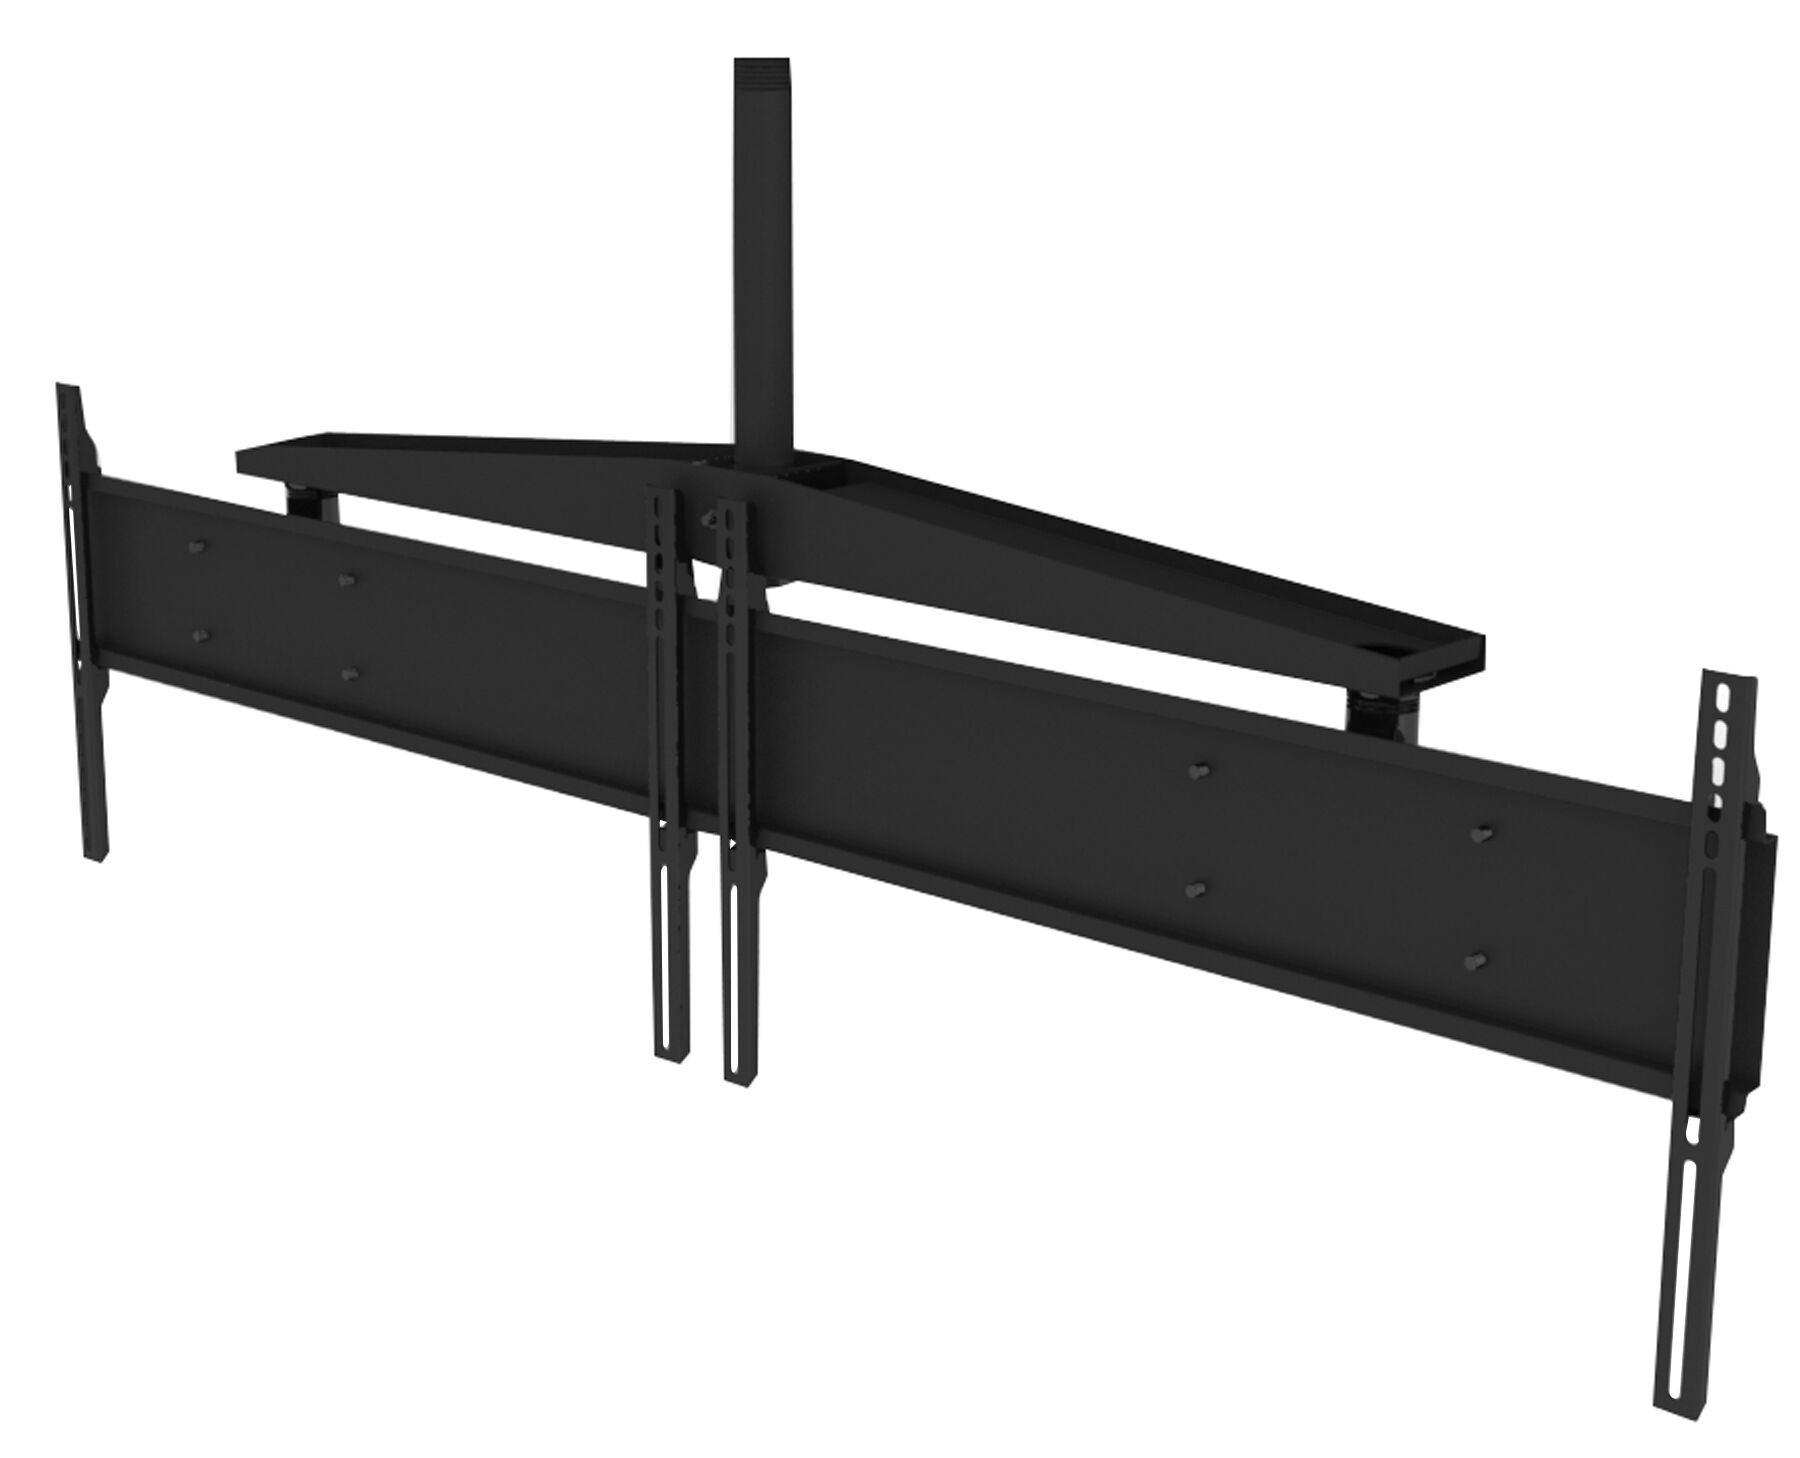 Dual Tilt Universal Ceiling Mount for 37